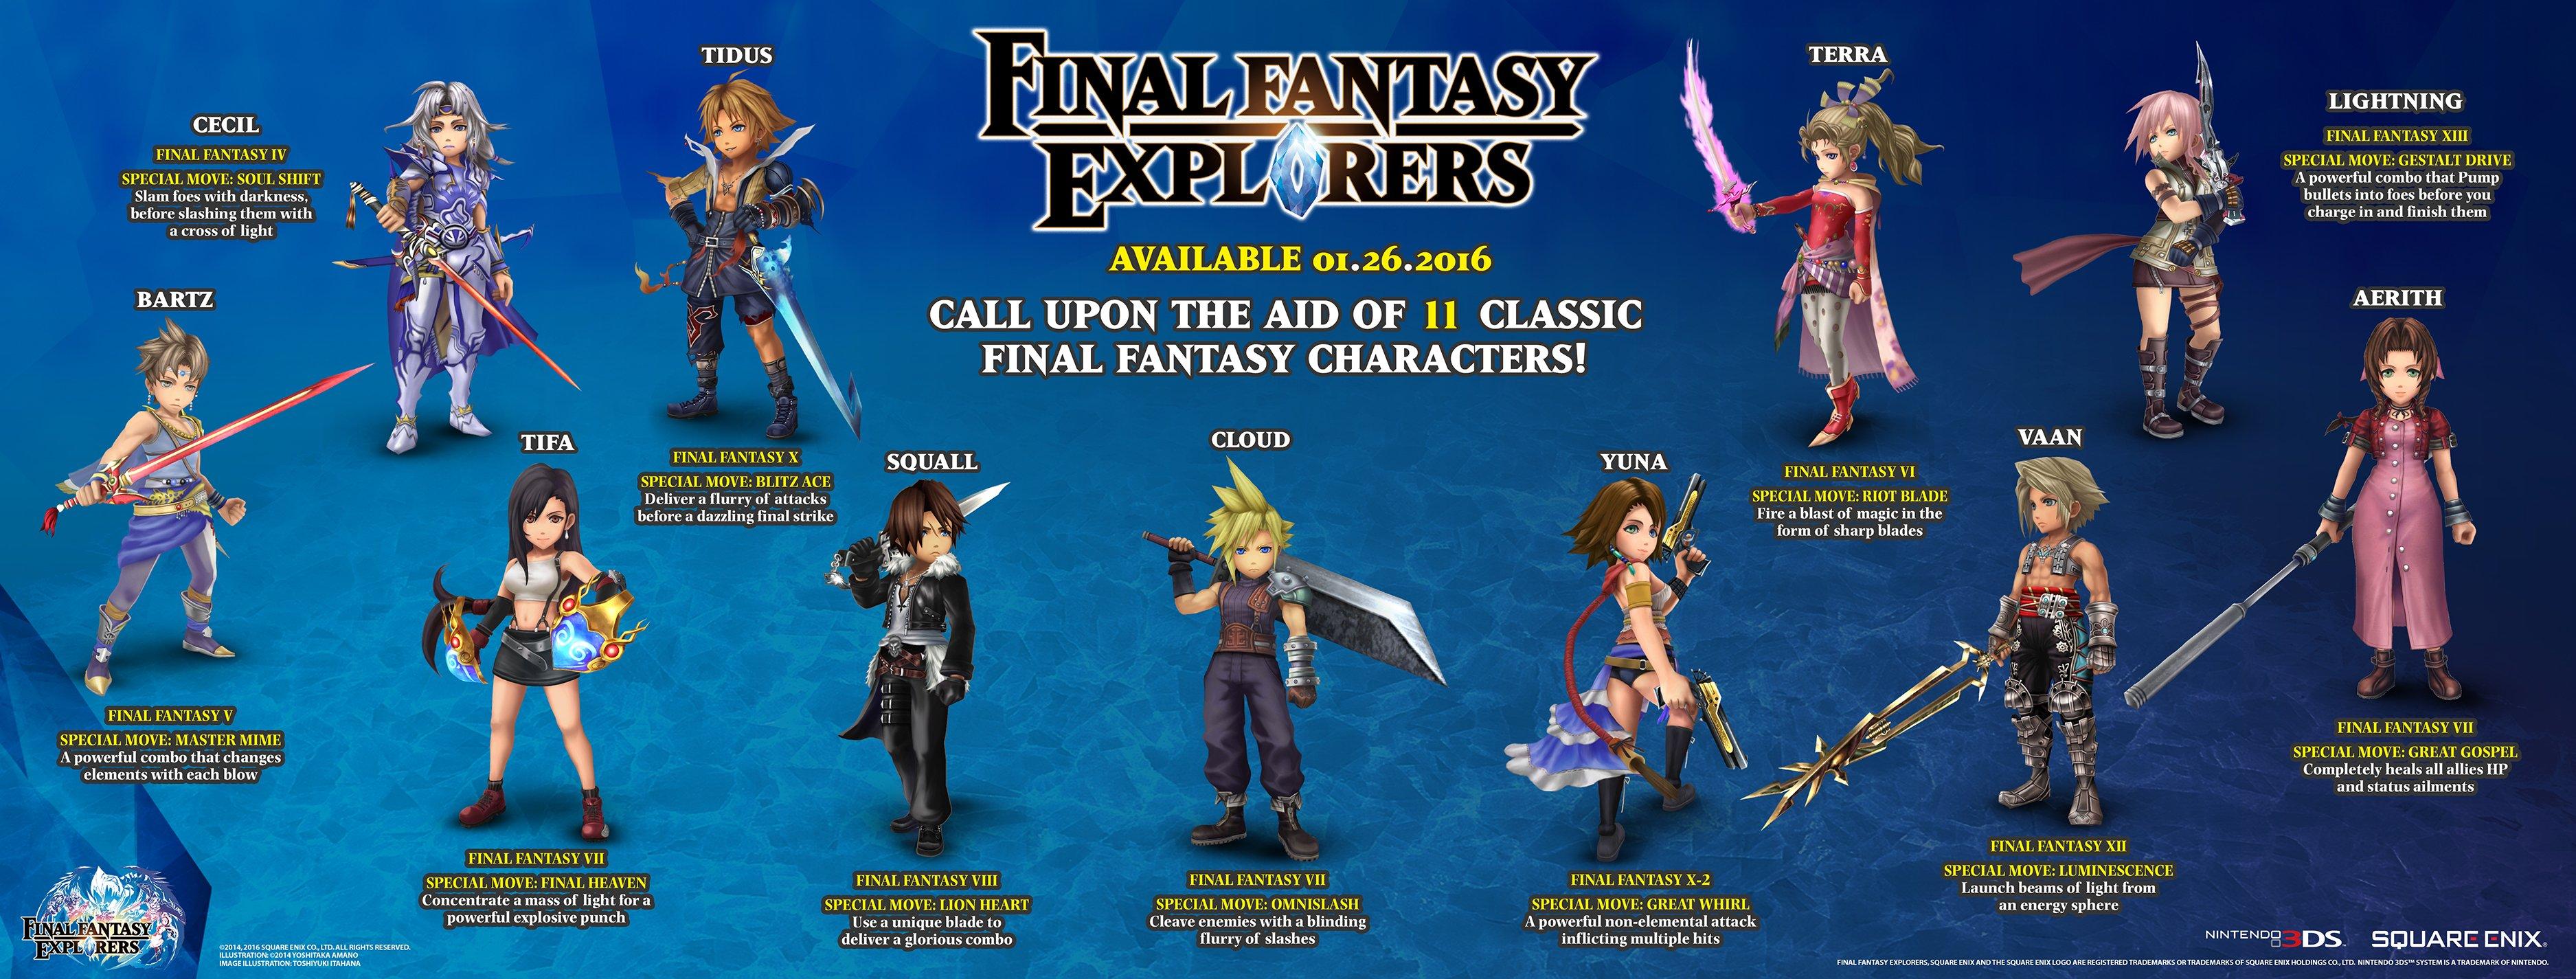 final fantasy explorers legacy characters trance mode cloud squall cecil bartz lightning yuna tifa tidus terra aerith vaan square enix 3ds